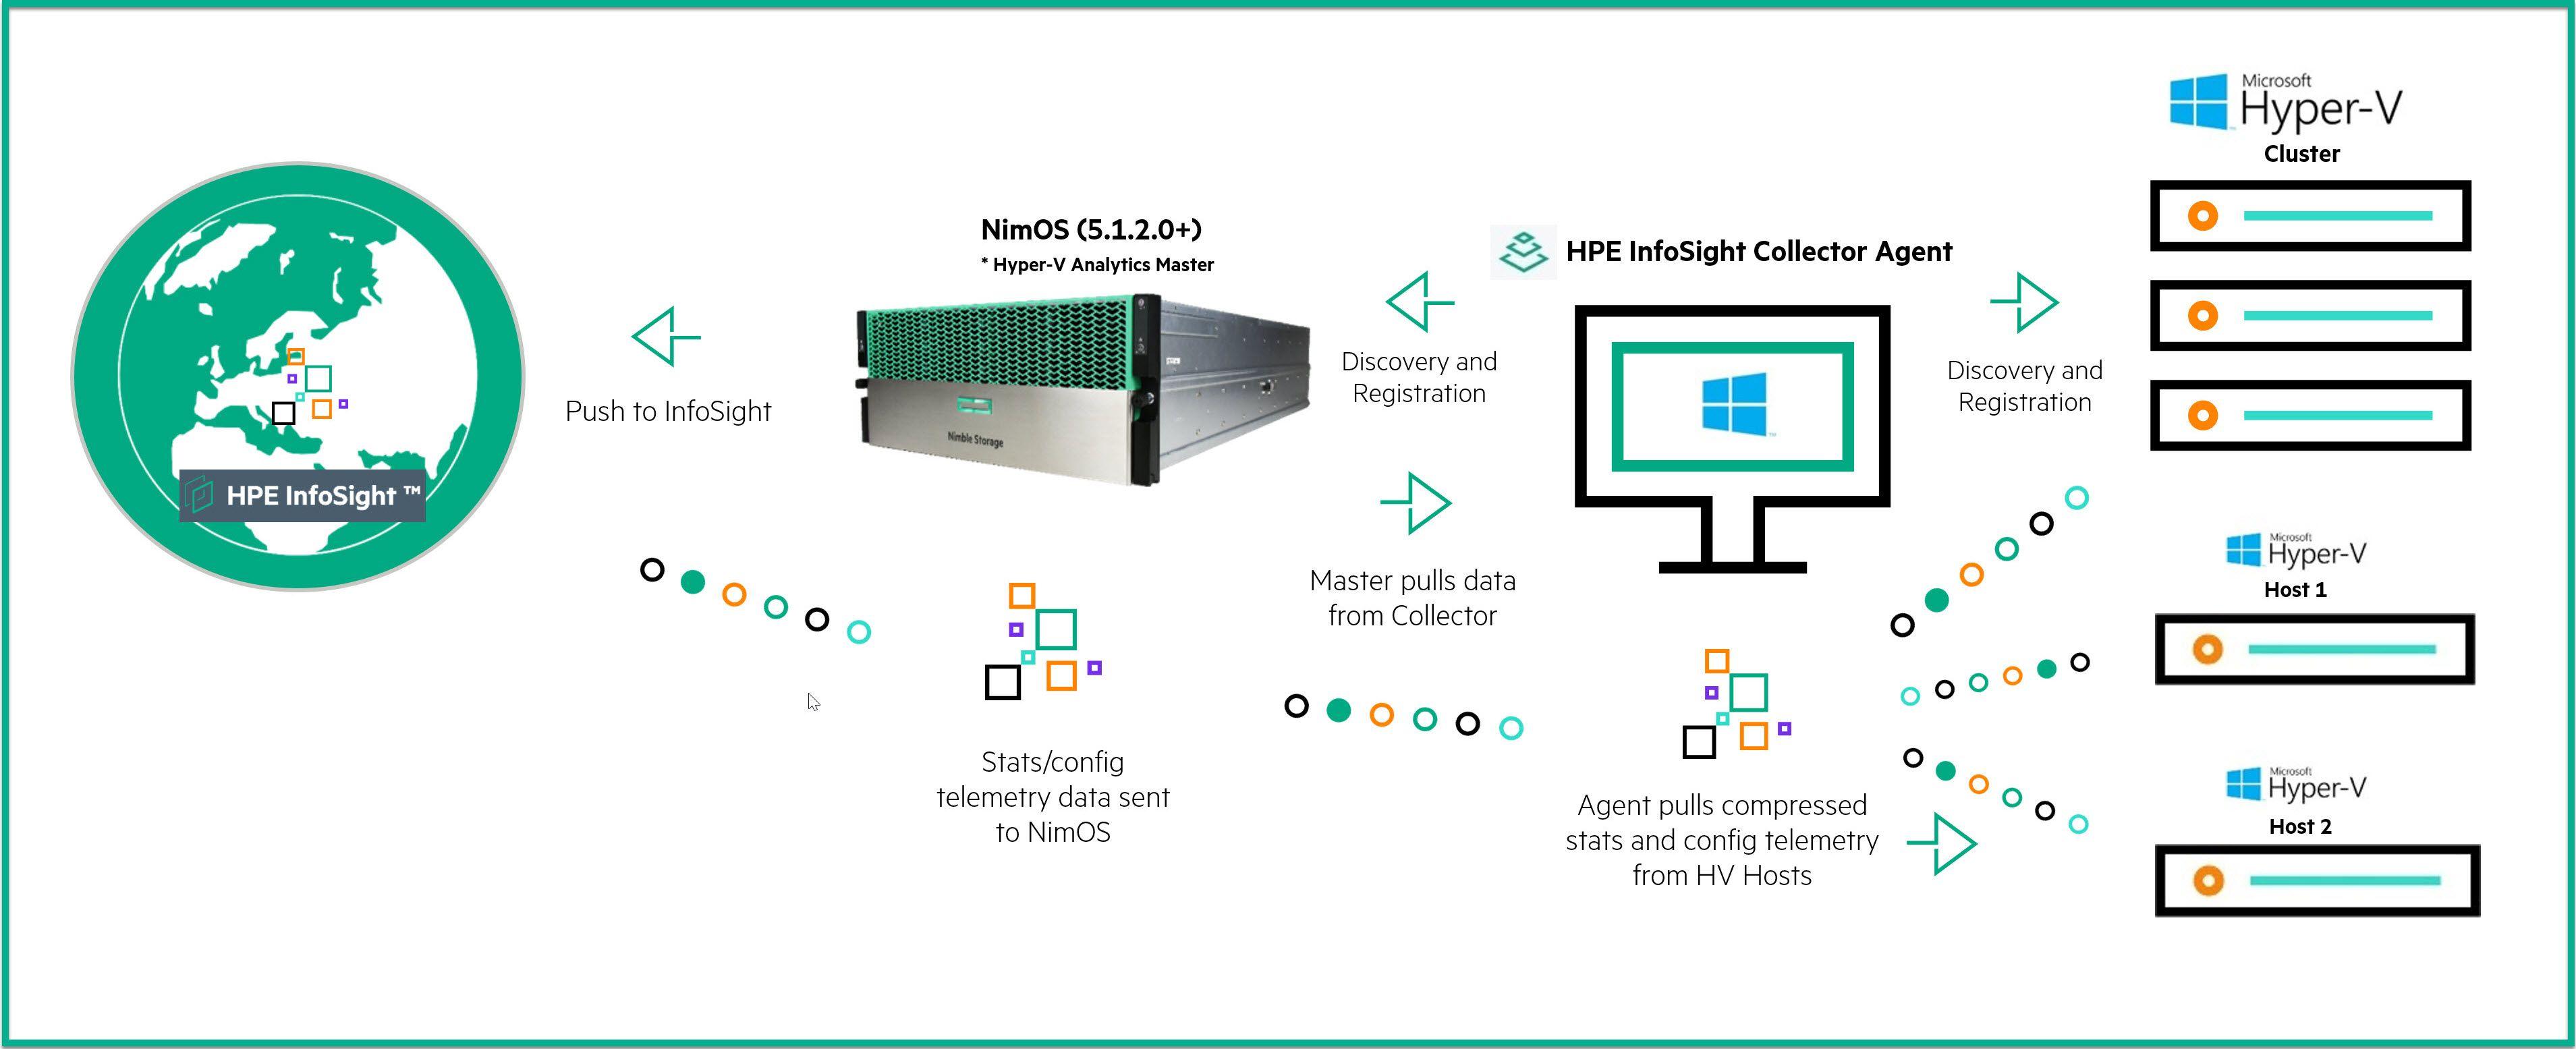 Flow of Hyper-V information to HPE InfoSight